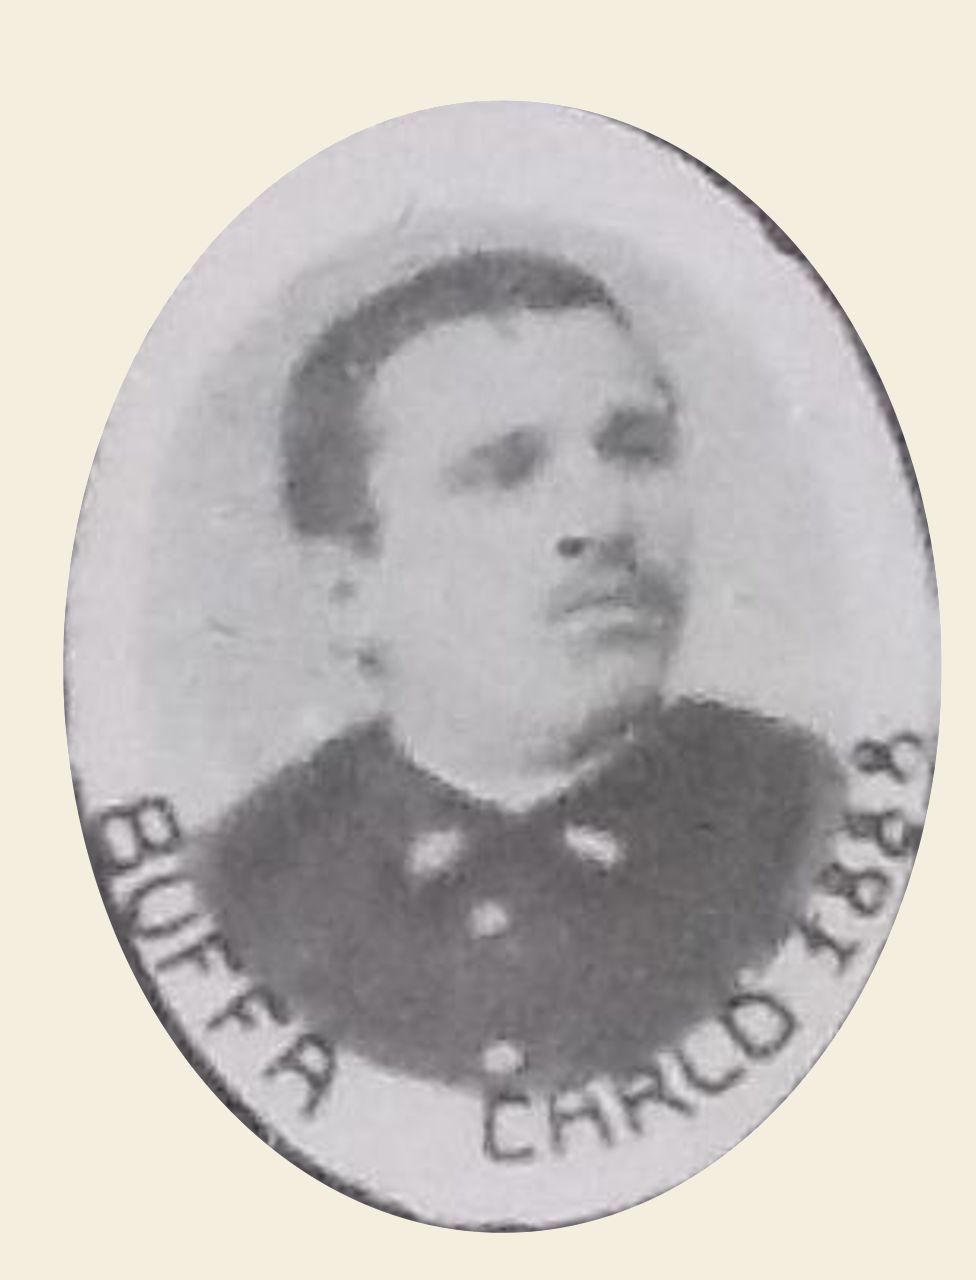 Buffa Carlo